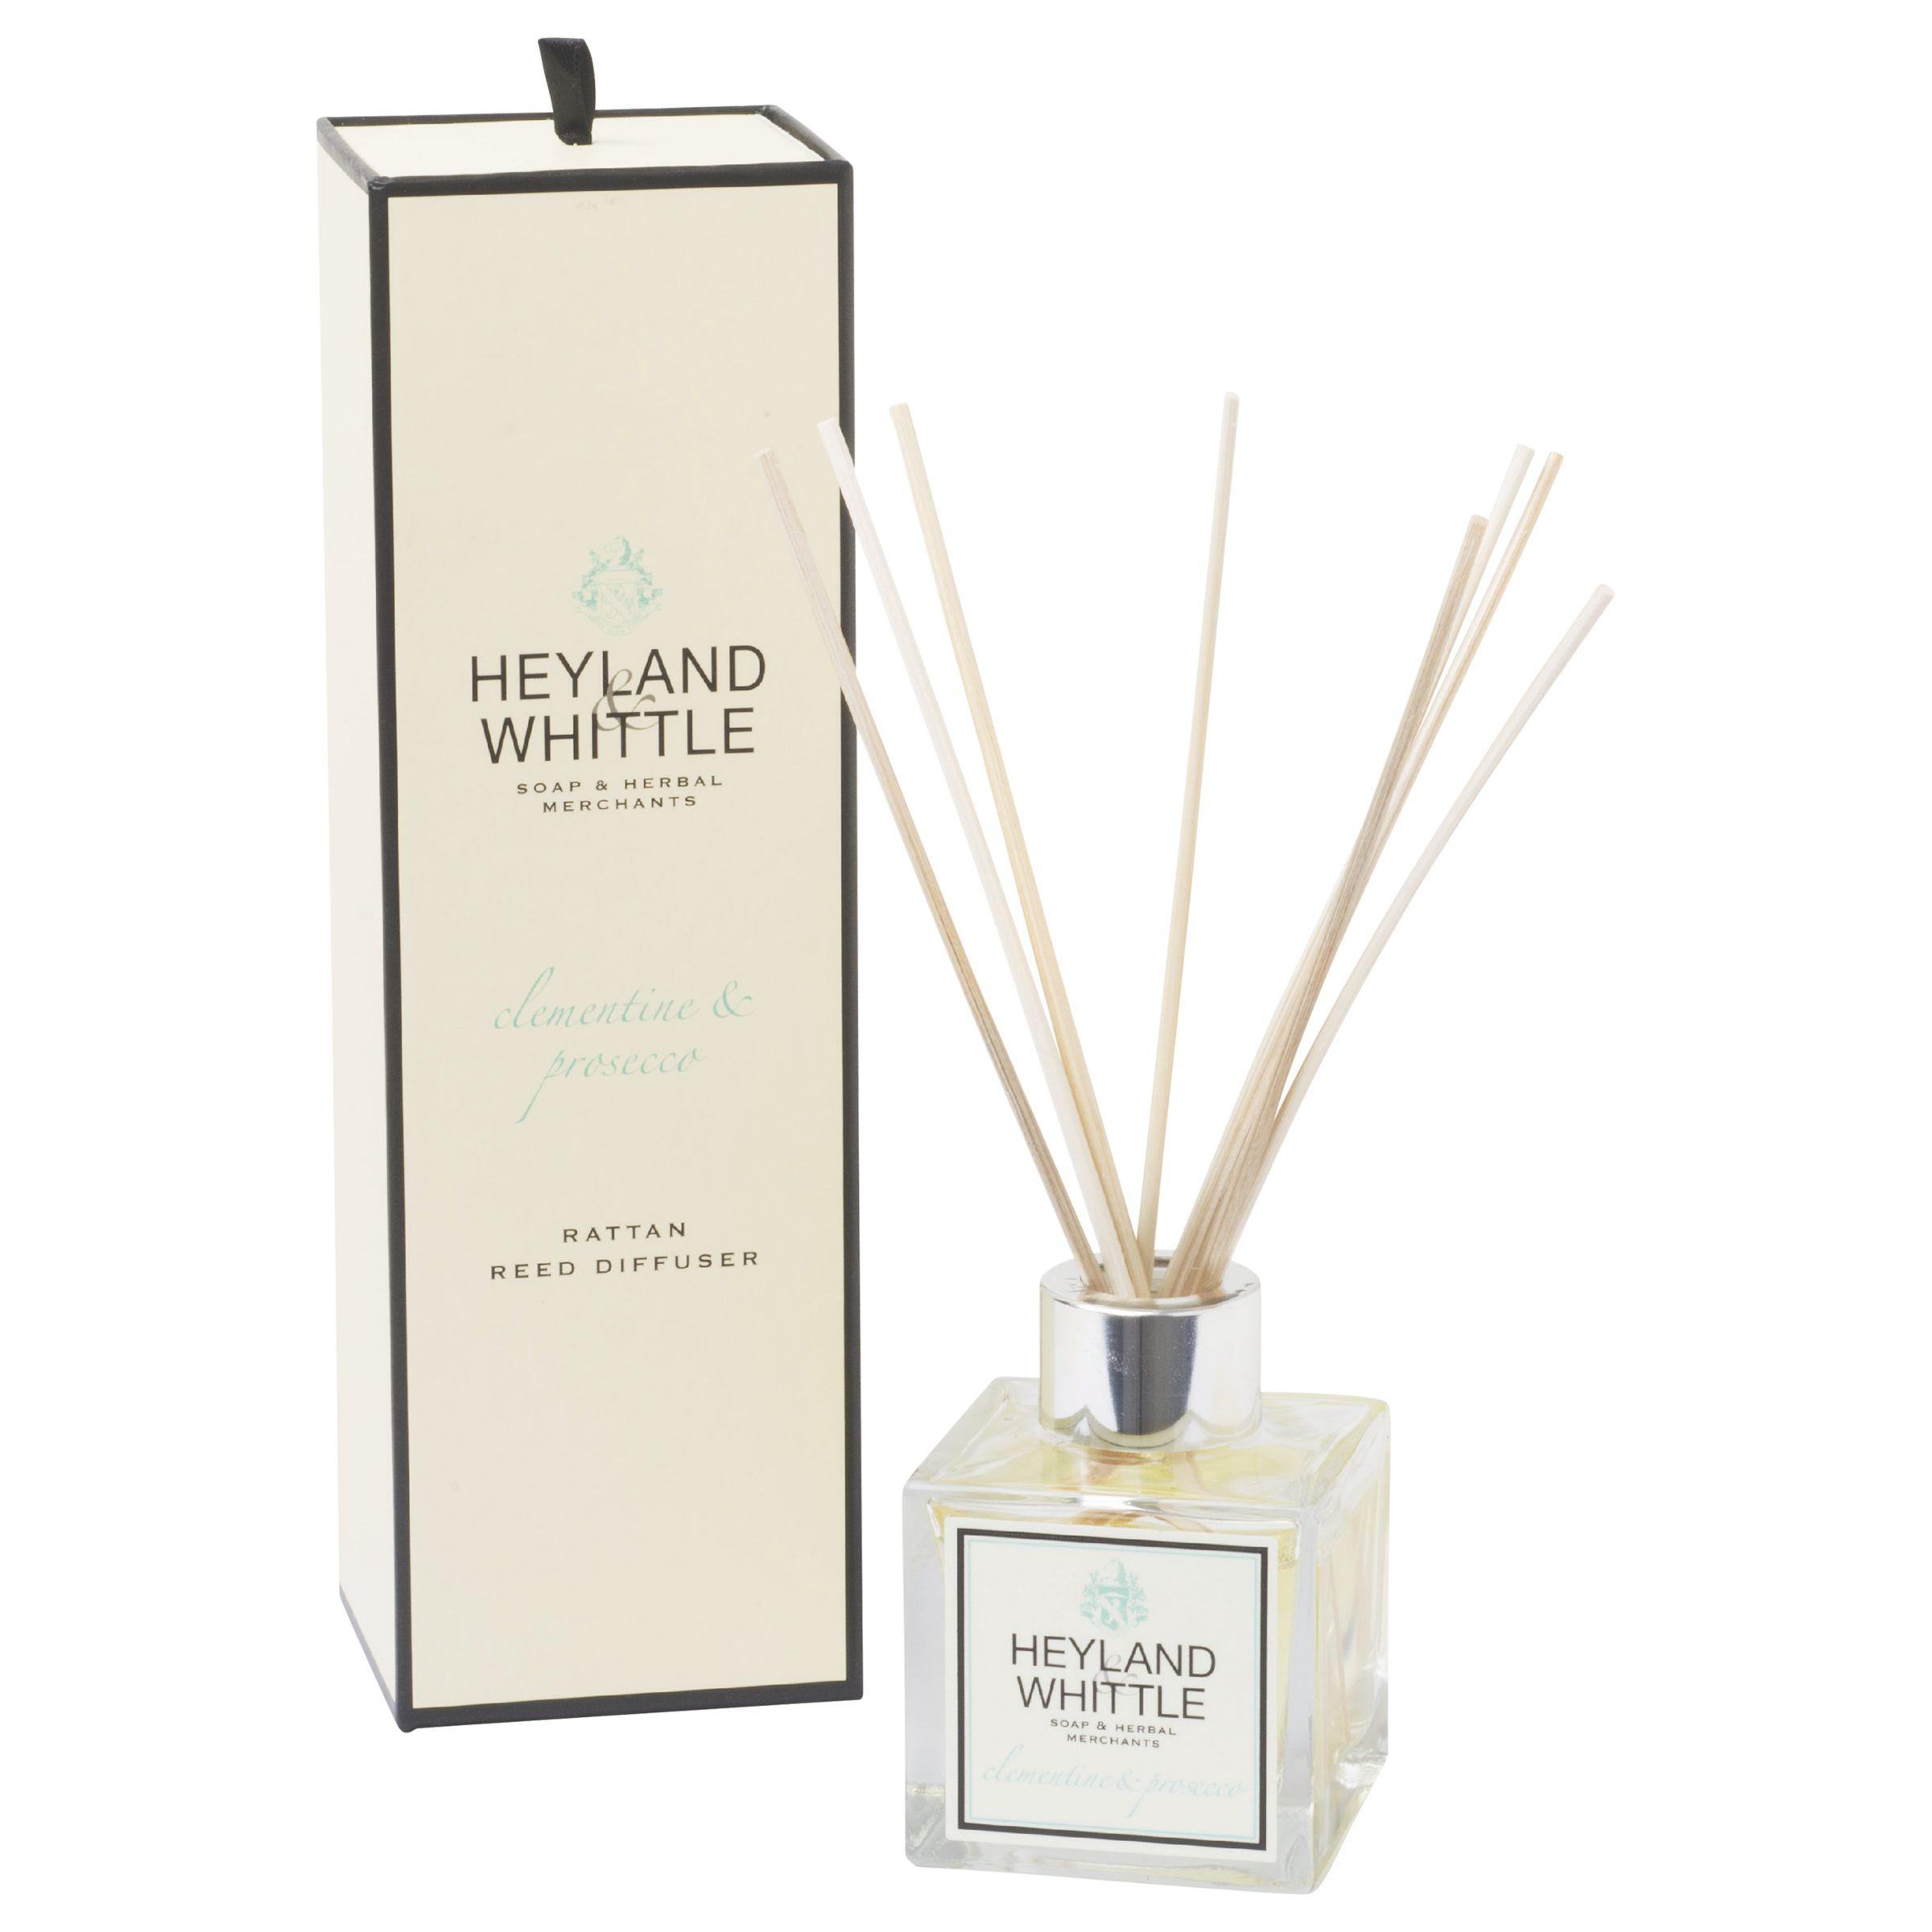 Heyland & Whittle Heyland & Whittle Clementine & Prosecco Diffuser, 100ml